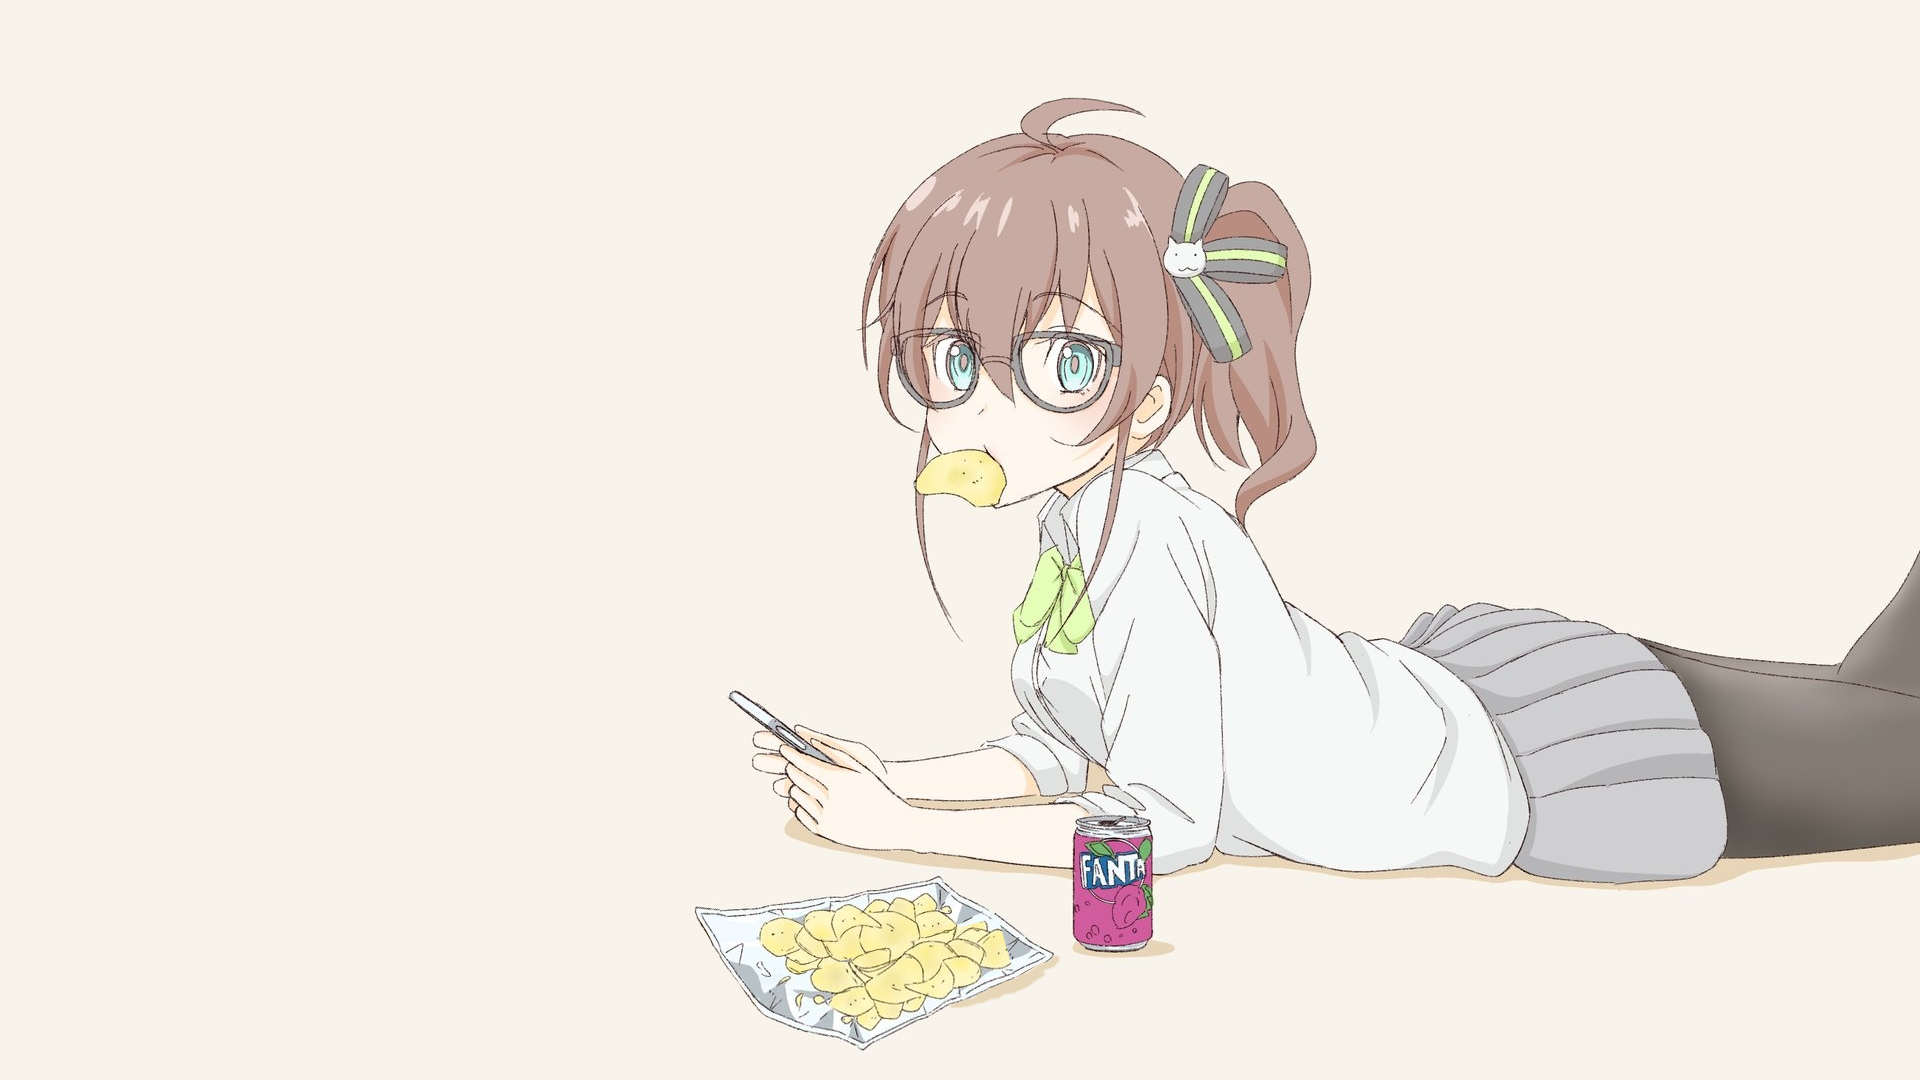 Anime 1920x1080 anime manga anime girls simple background chips Fanta soda meganekko pigtails